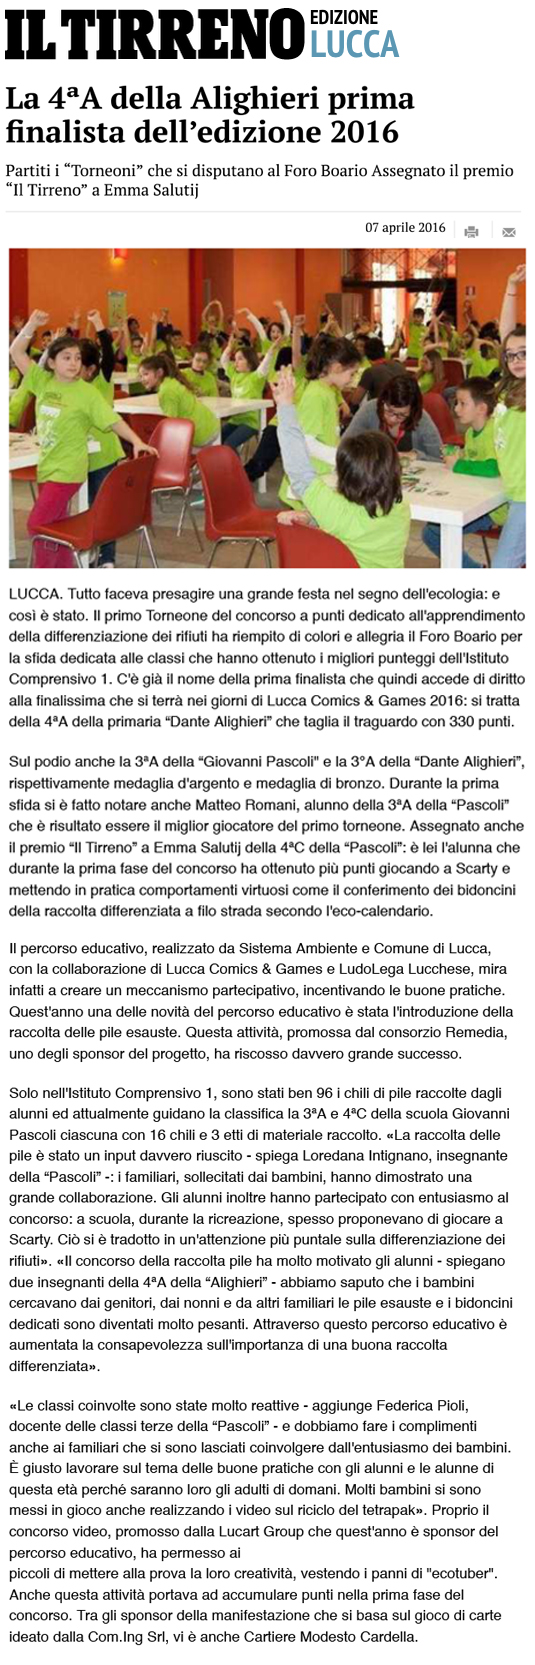 Tirreno_7aprile2016